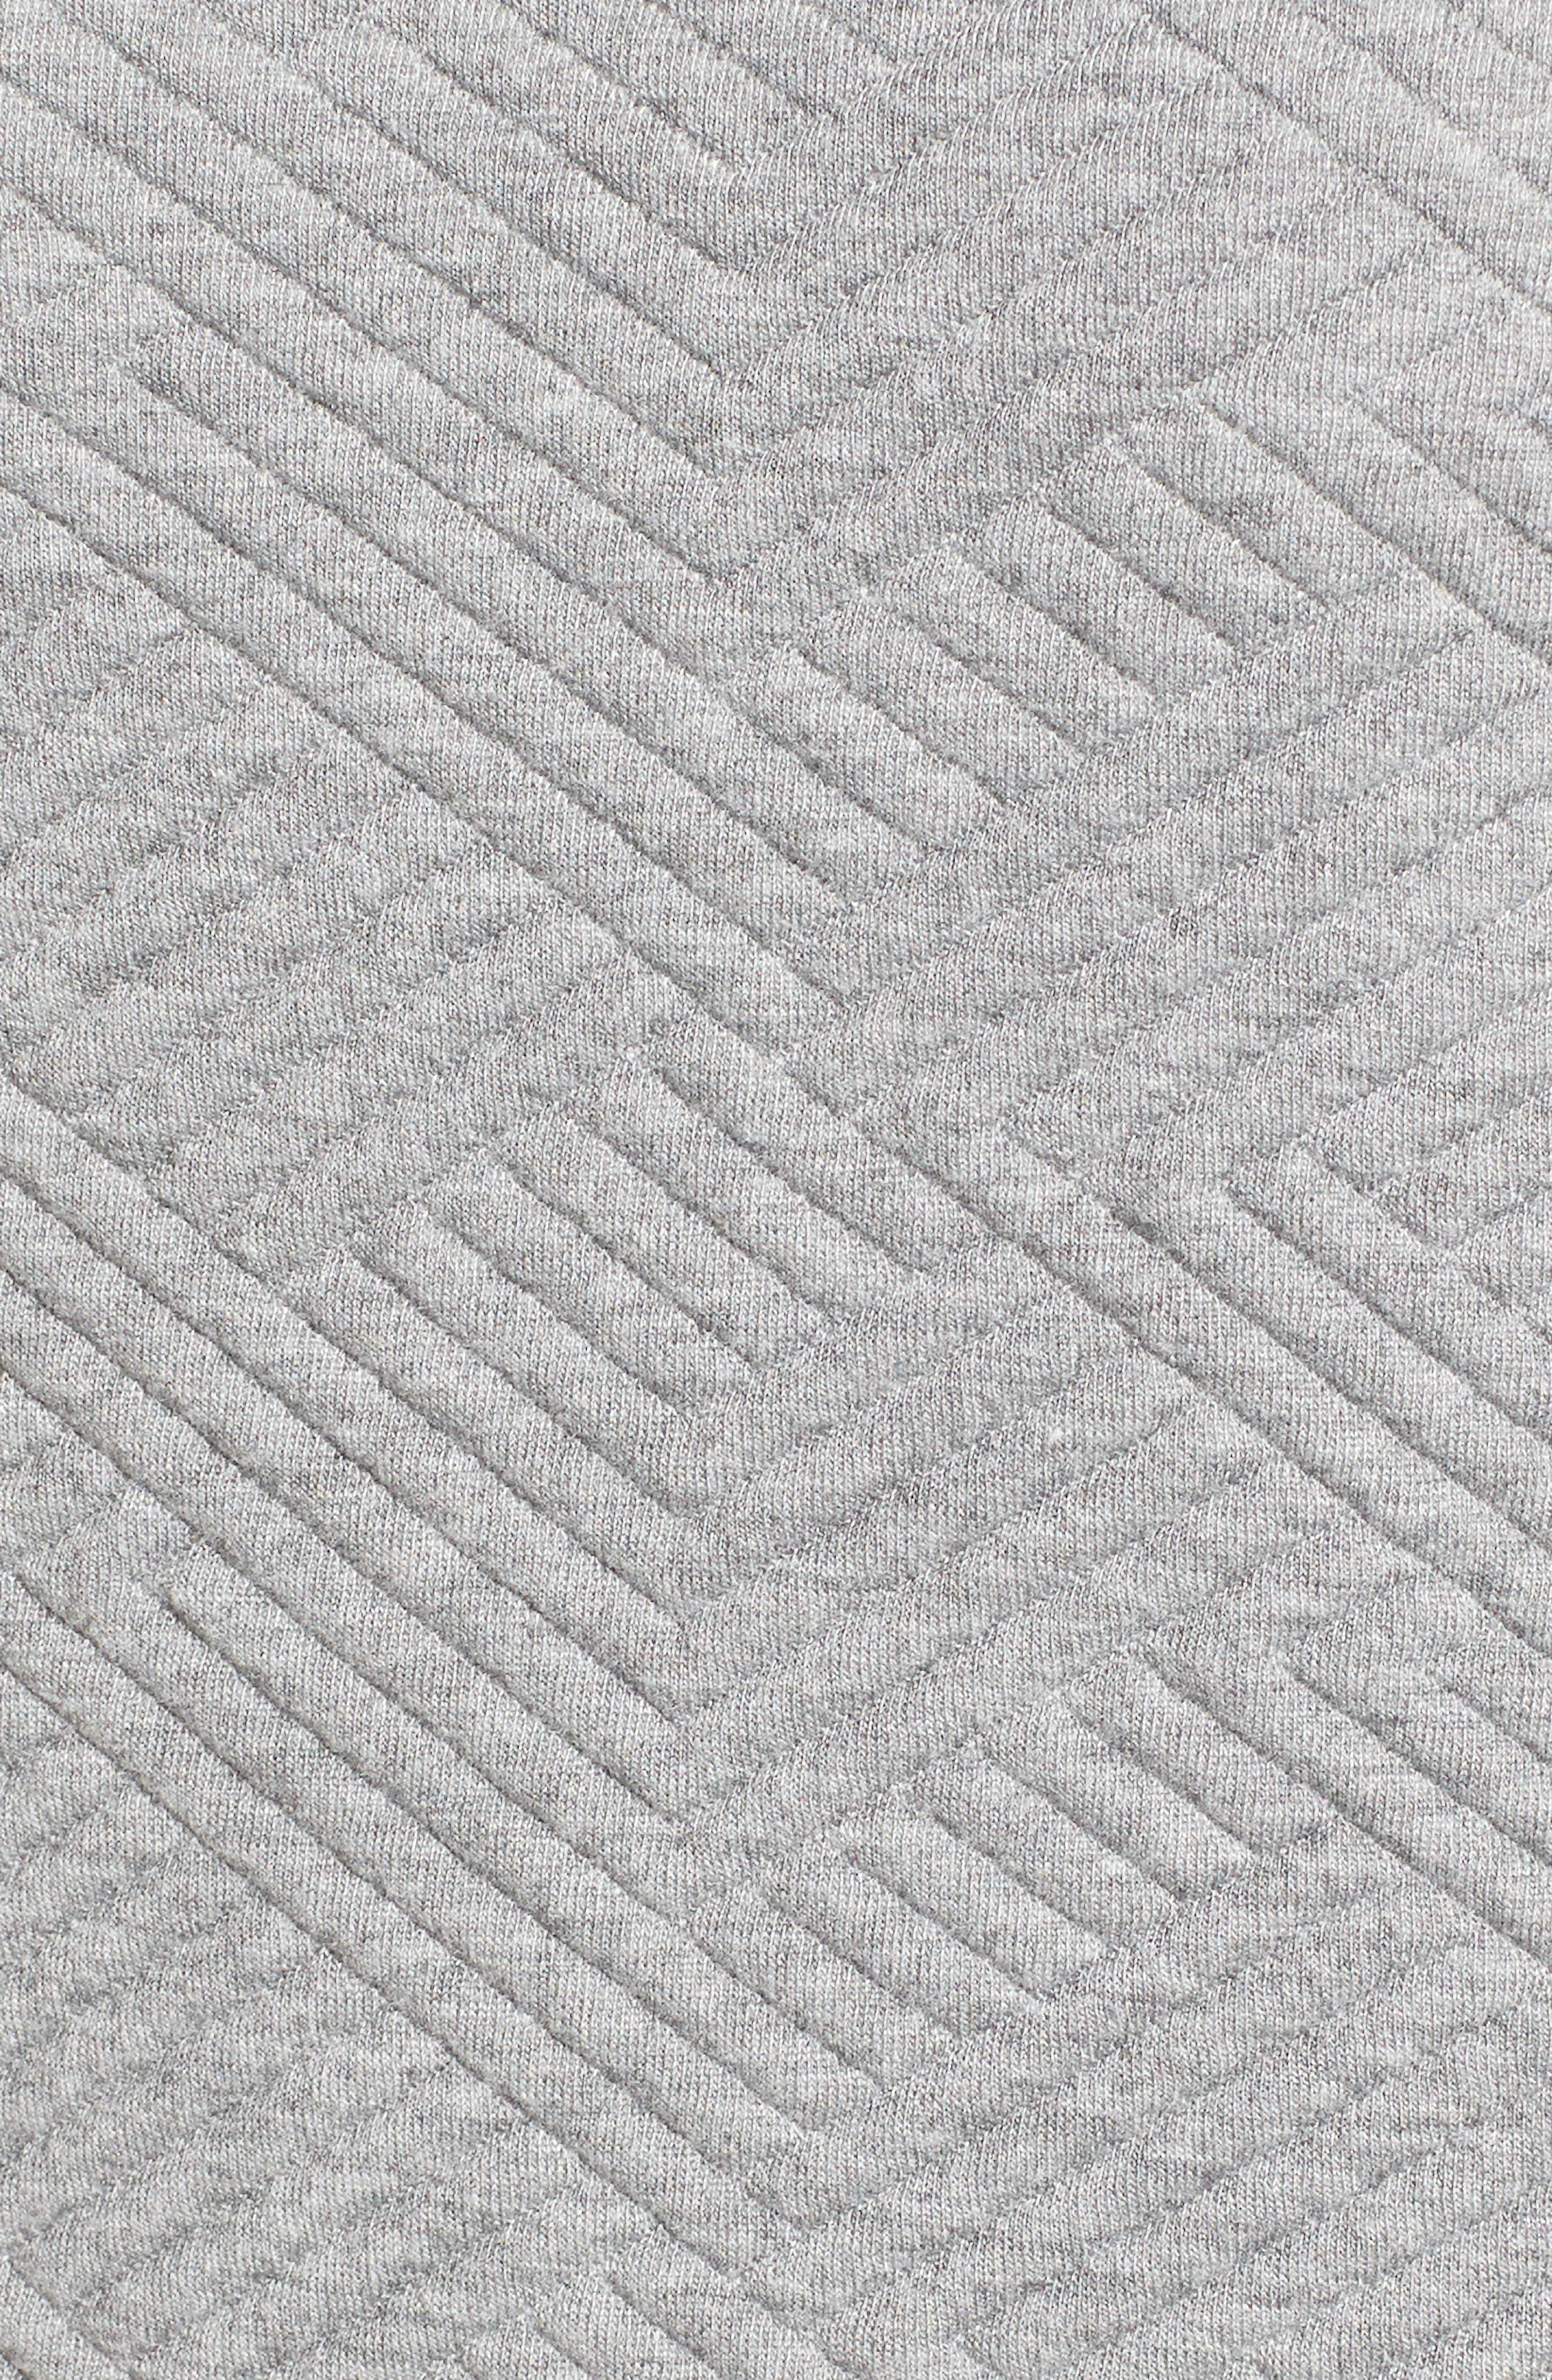 Textured Elbow Sleeve Tunic Dress,                             Alternate thumbnail 7, color,                             030